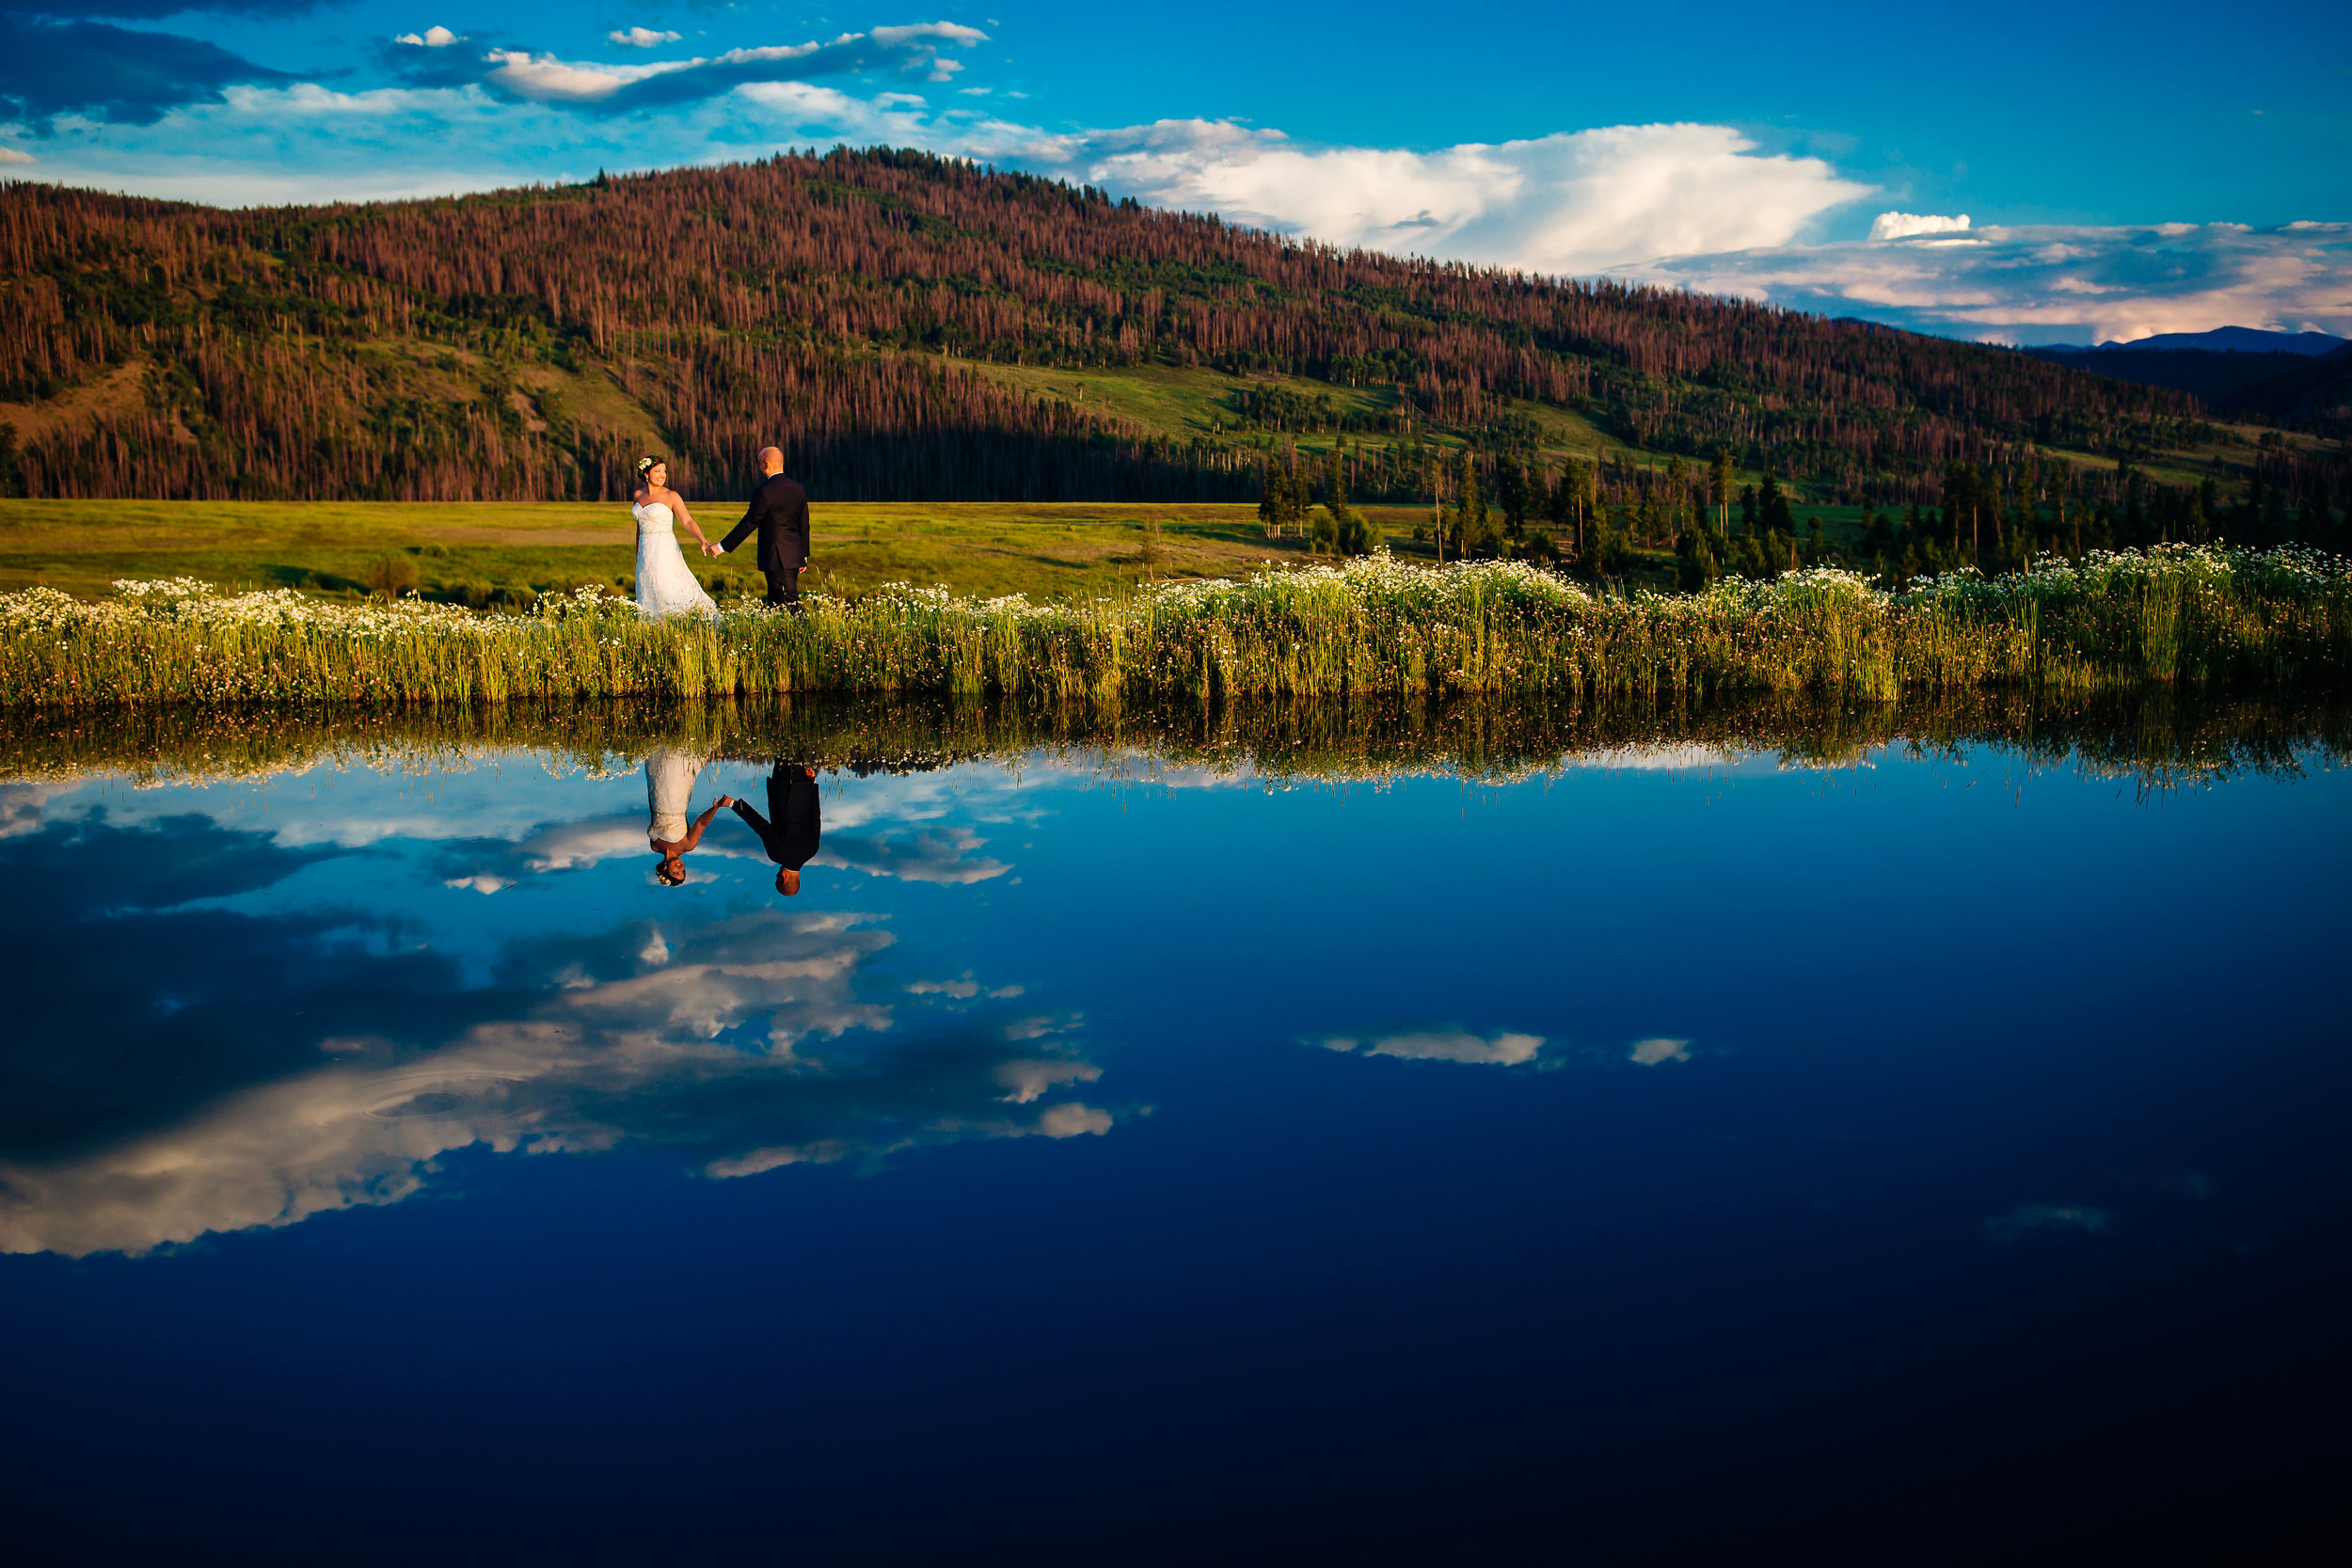 kaitlin_kurt_bridegroomportraits-89